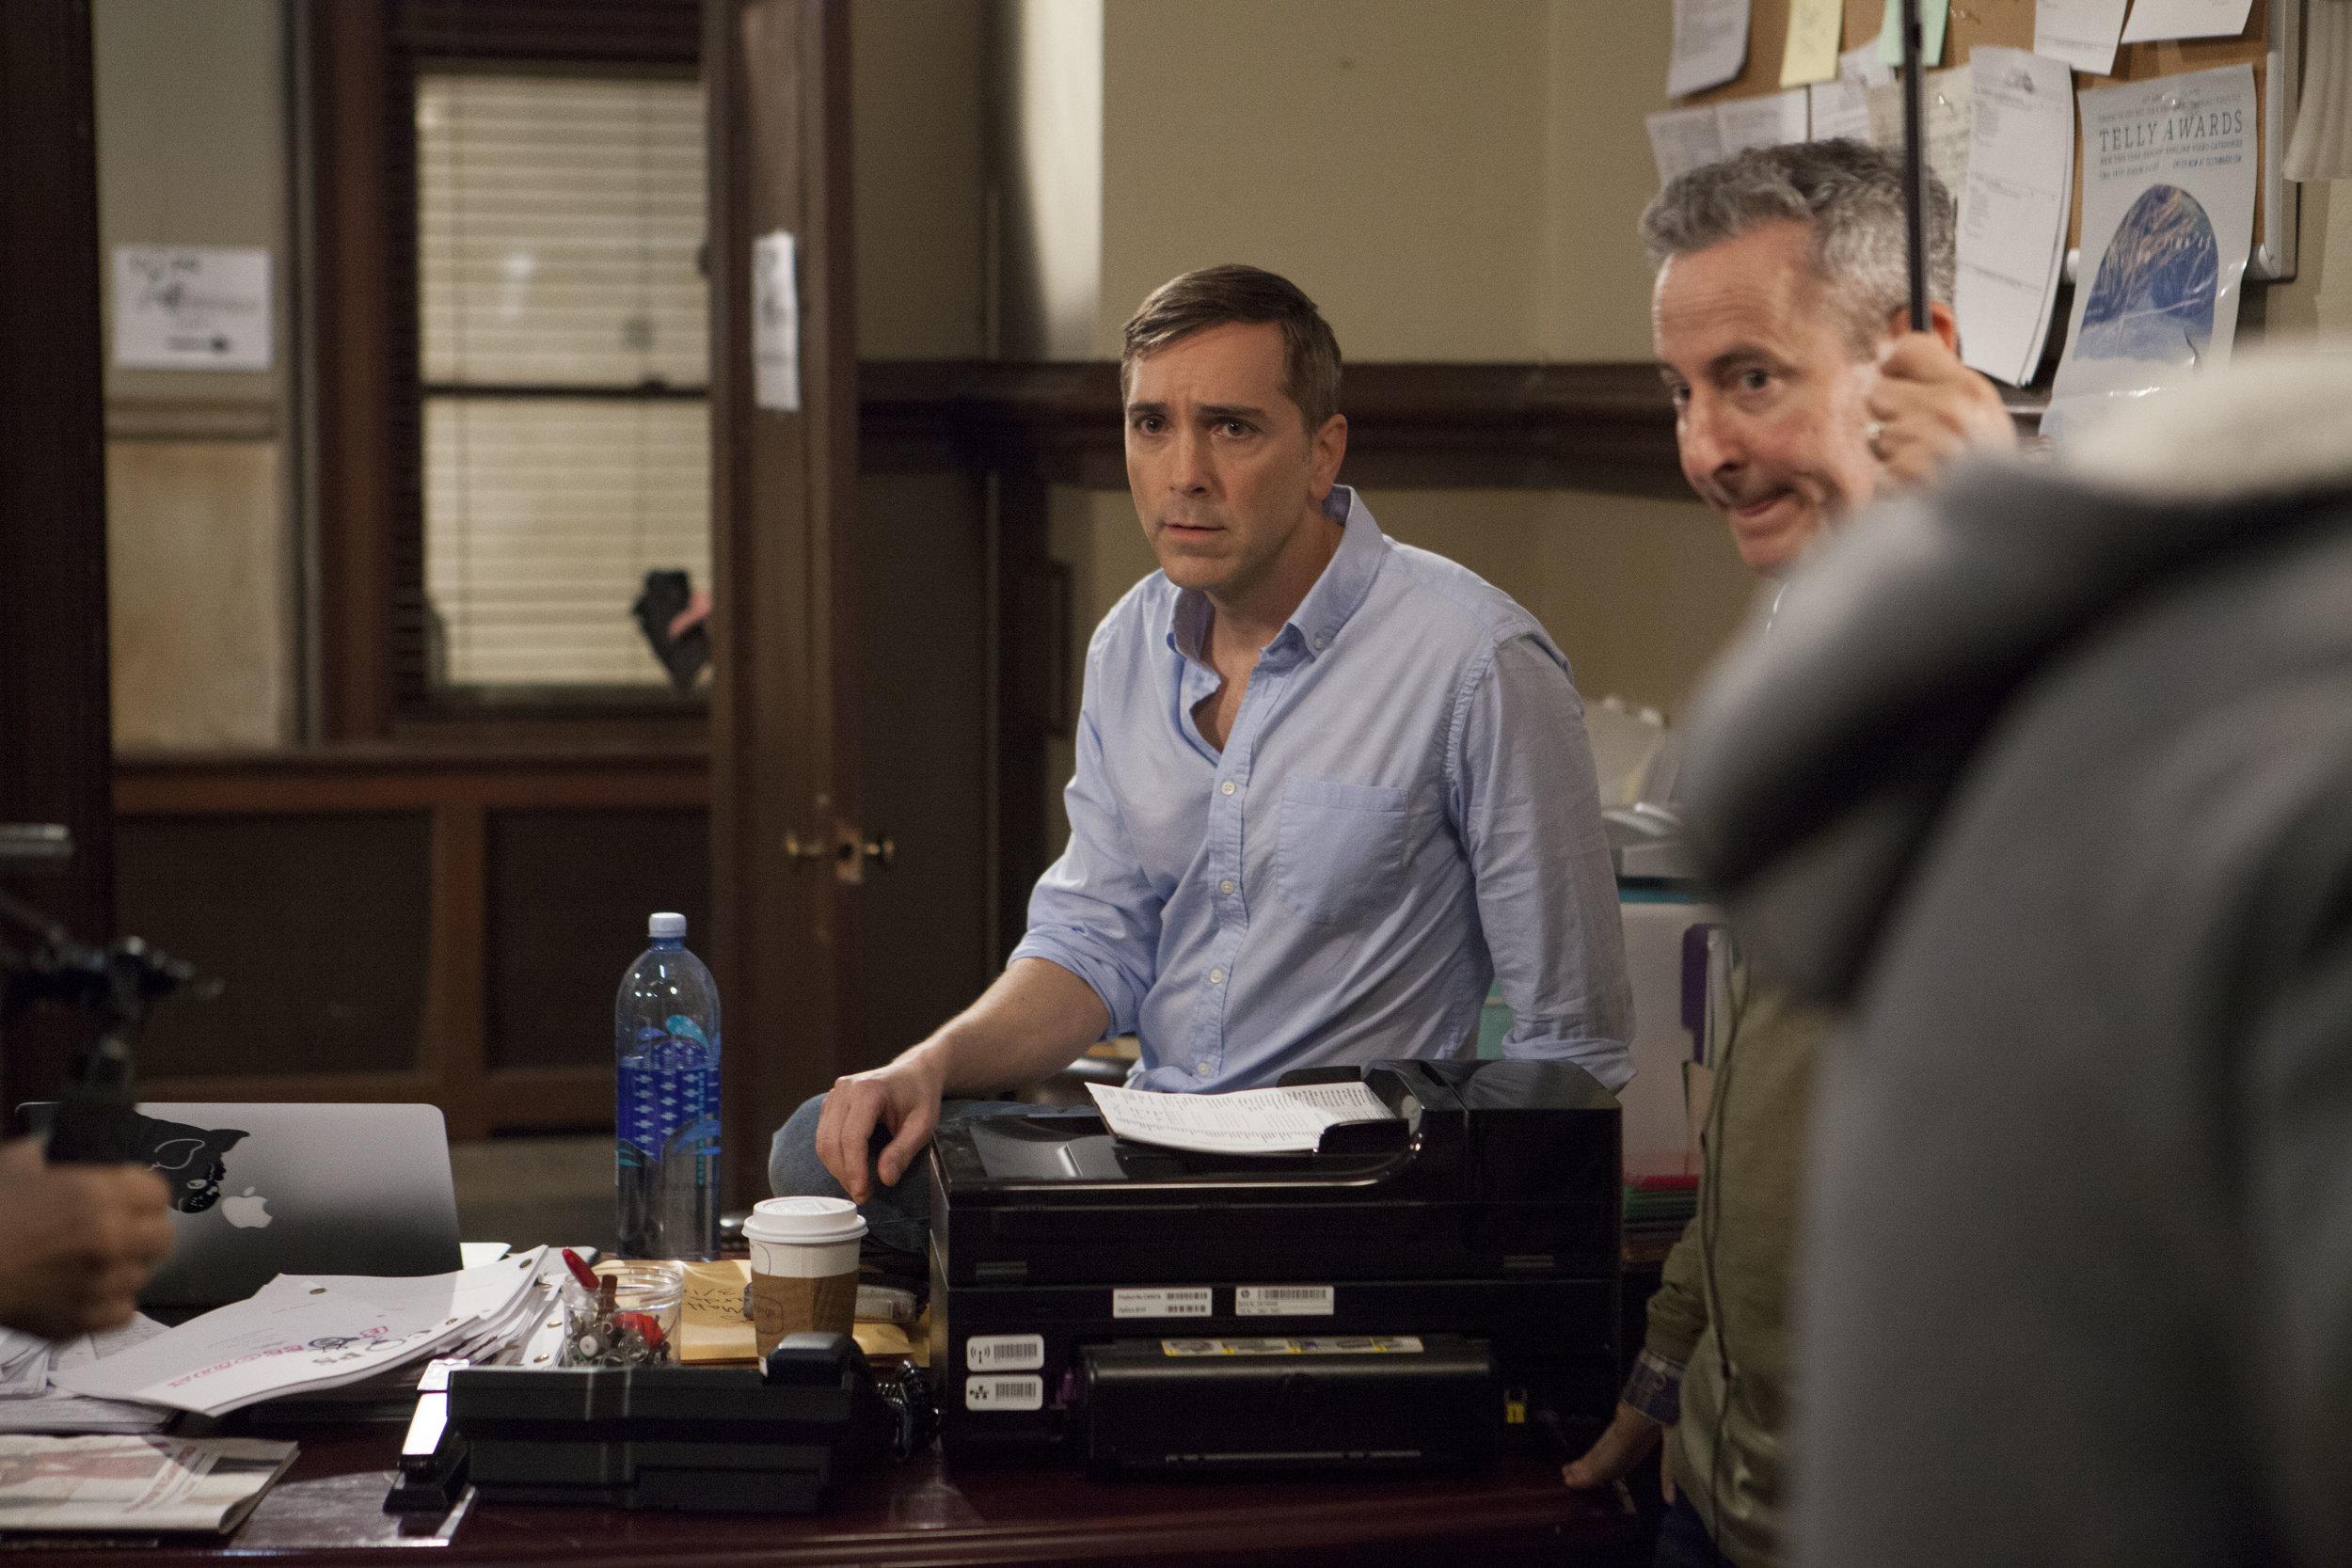 "1/16/16 Cops & Bottoms Production Office Scene. L to R: Scott Lowell, Eddie Jemison (""Chaim"")"